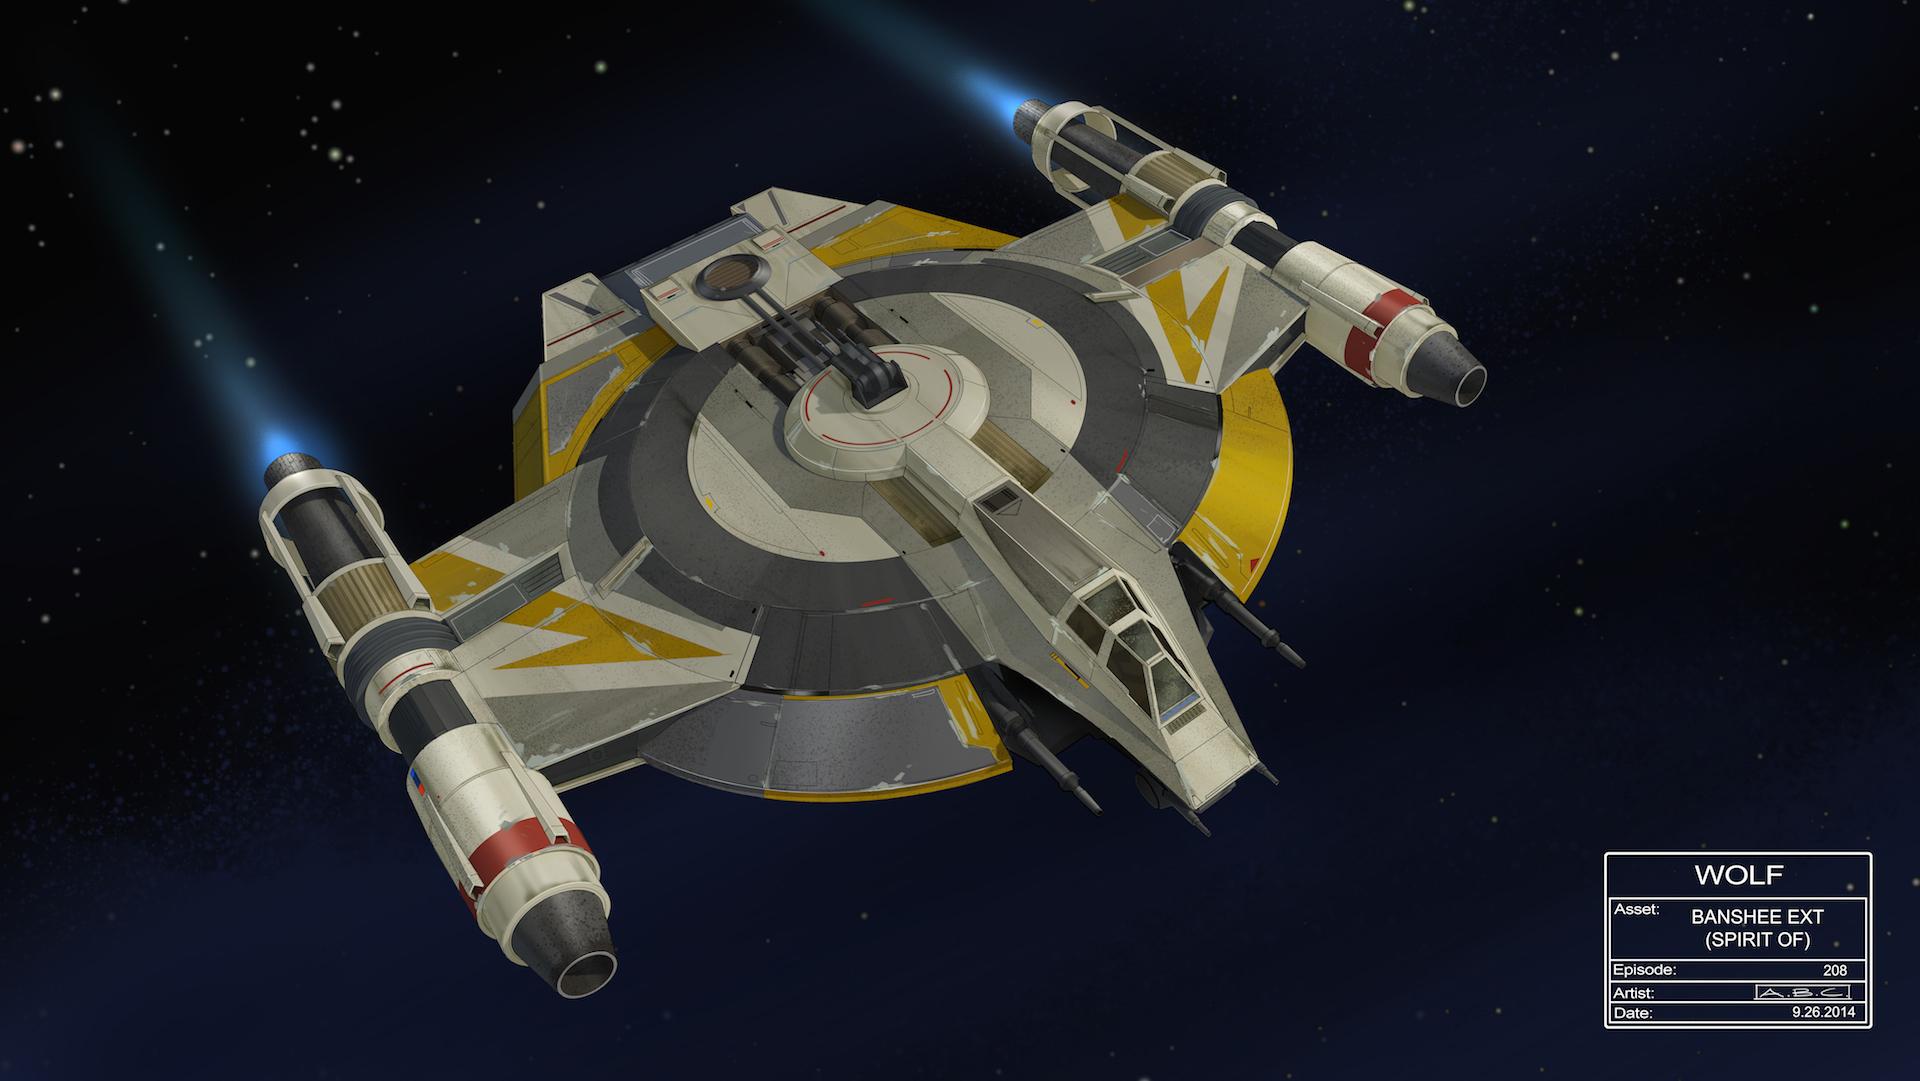 REBEL CAPTIVE Star Wars Rebels Raumschiffe